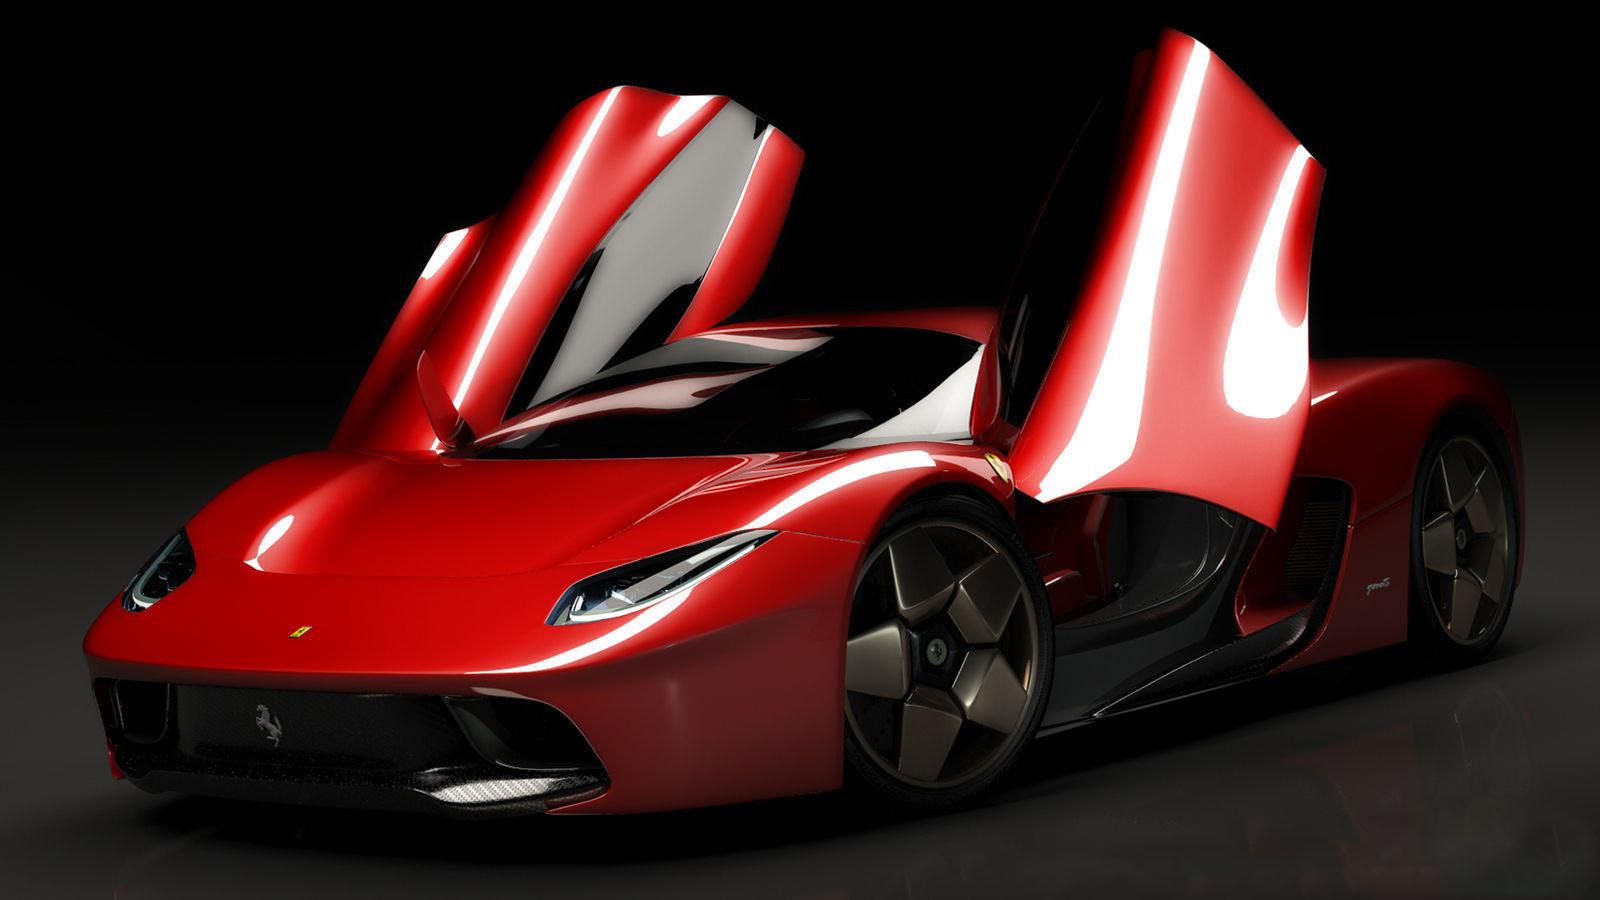 car i 2014 Ferrari GTE Concept Virtual por Angelo Granata